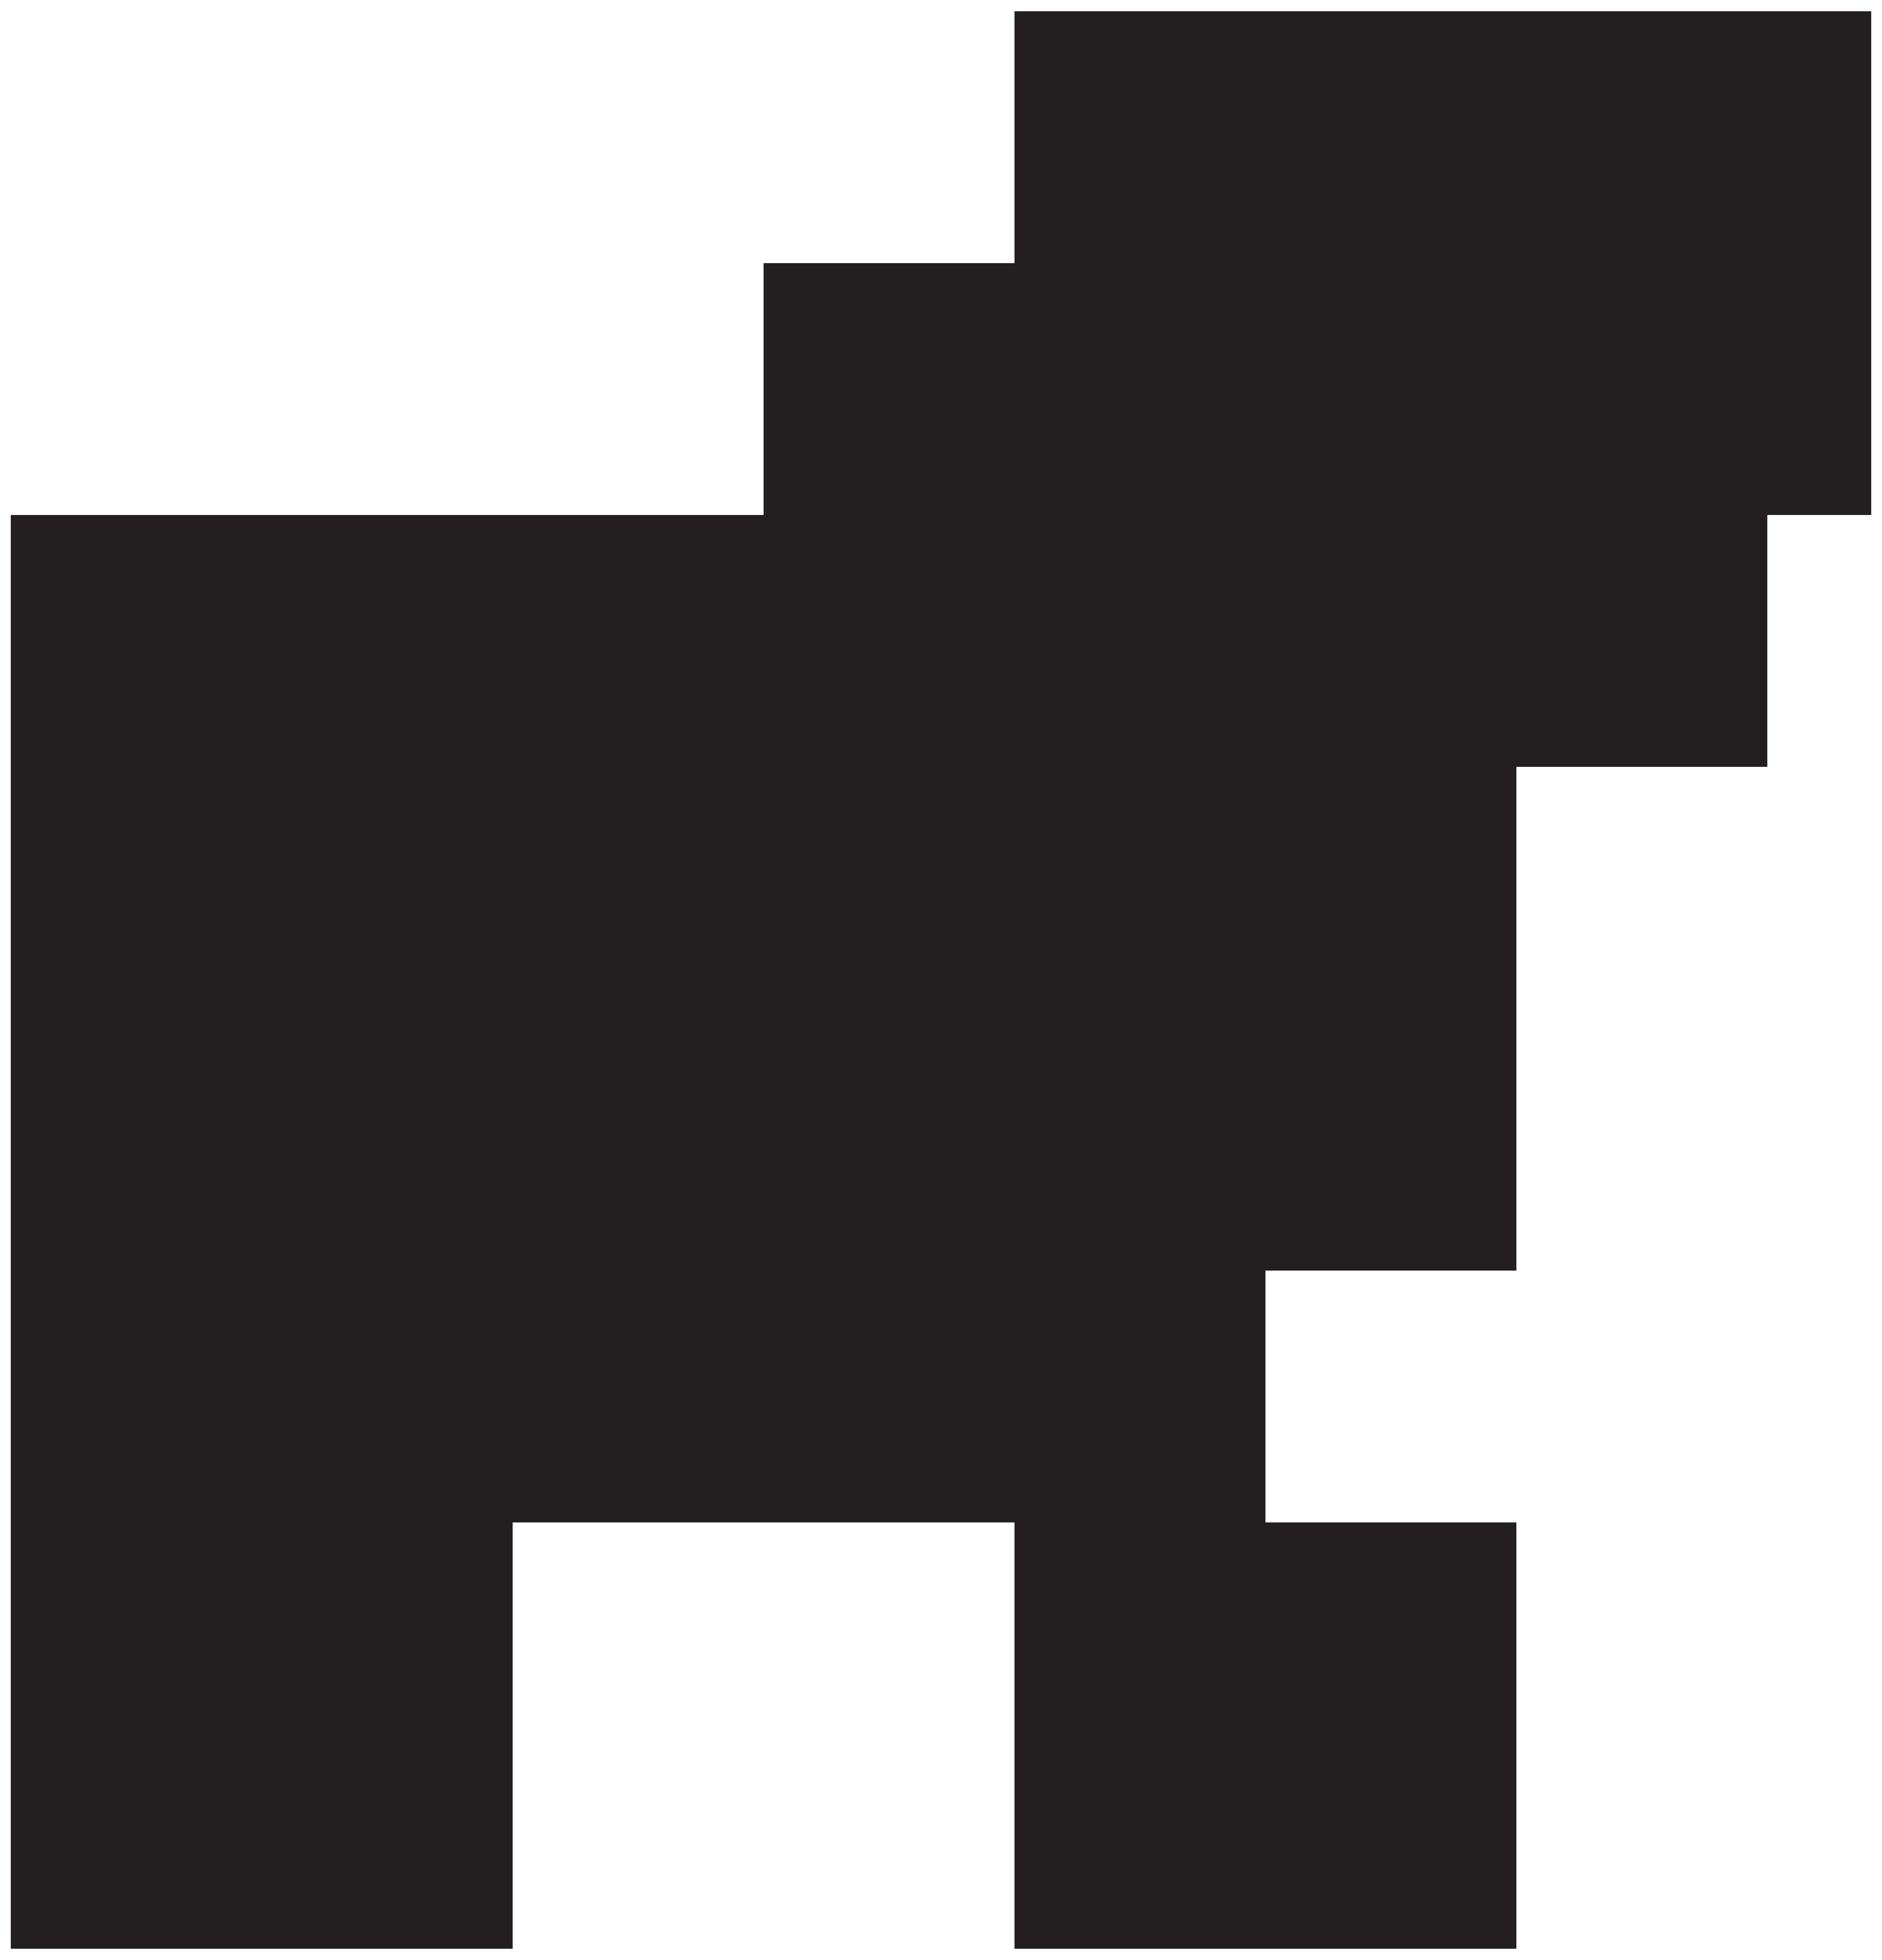 7680x8000 Bighorn Sheep Silhouette Png Clip Art Imageu200b Gallery